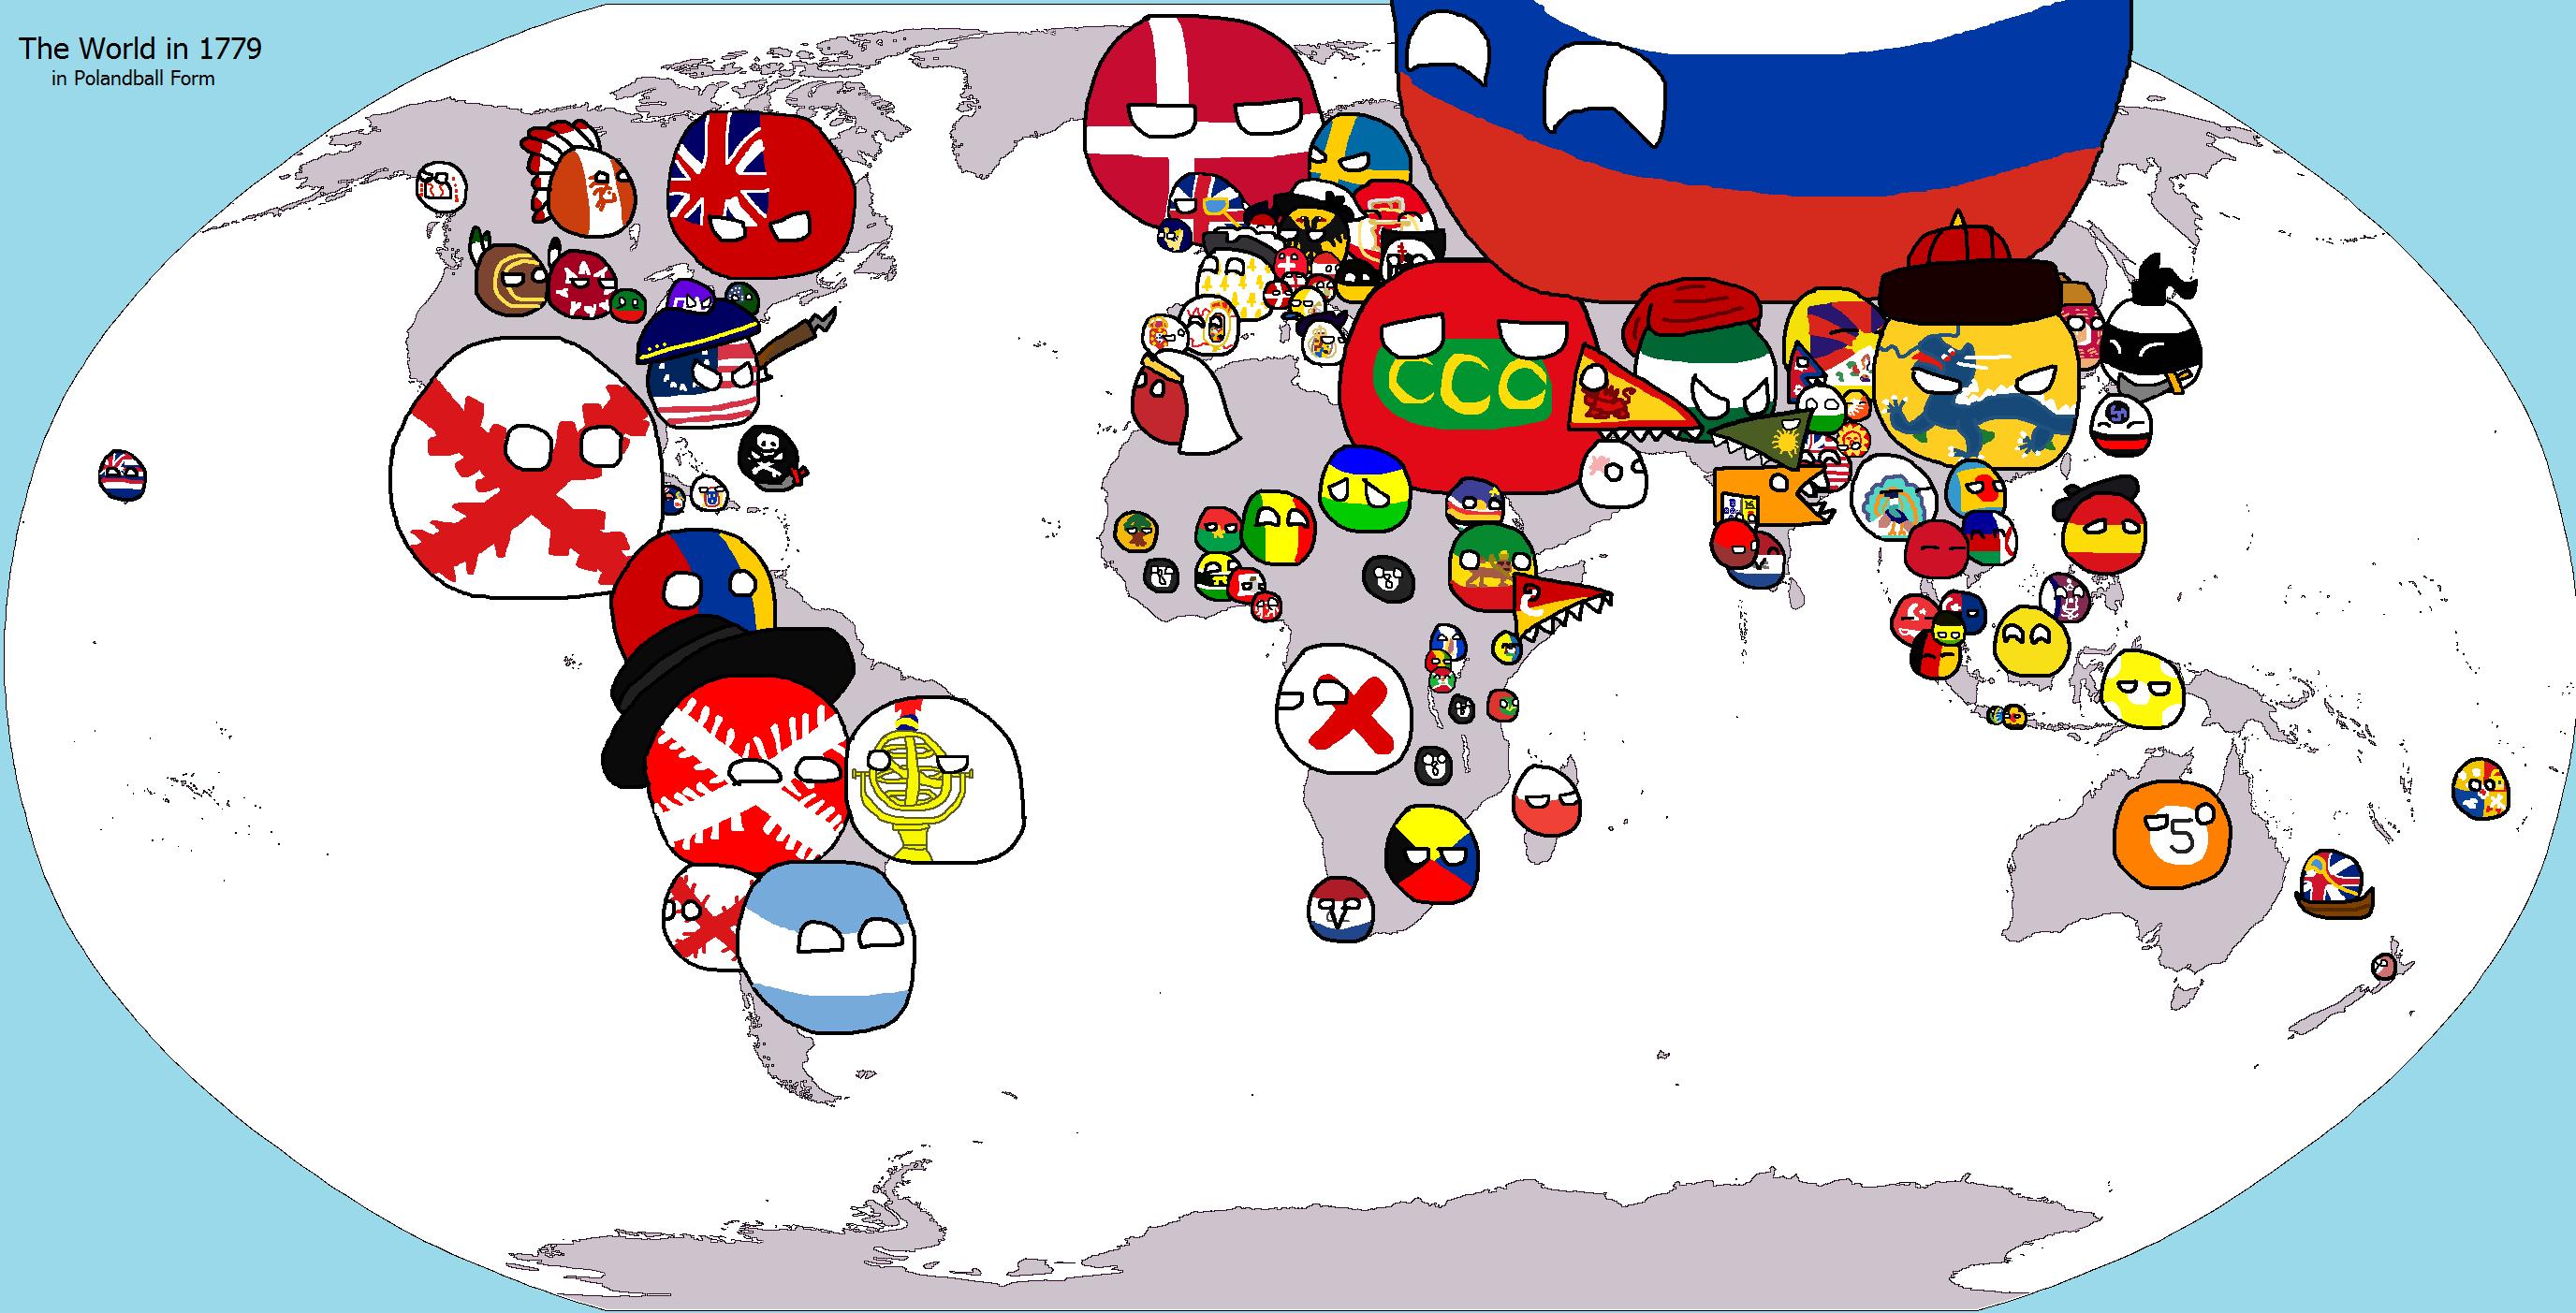 Polandball Map Of The World 2017.Polandball Map Europe 2017 Www Topsimages Com